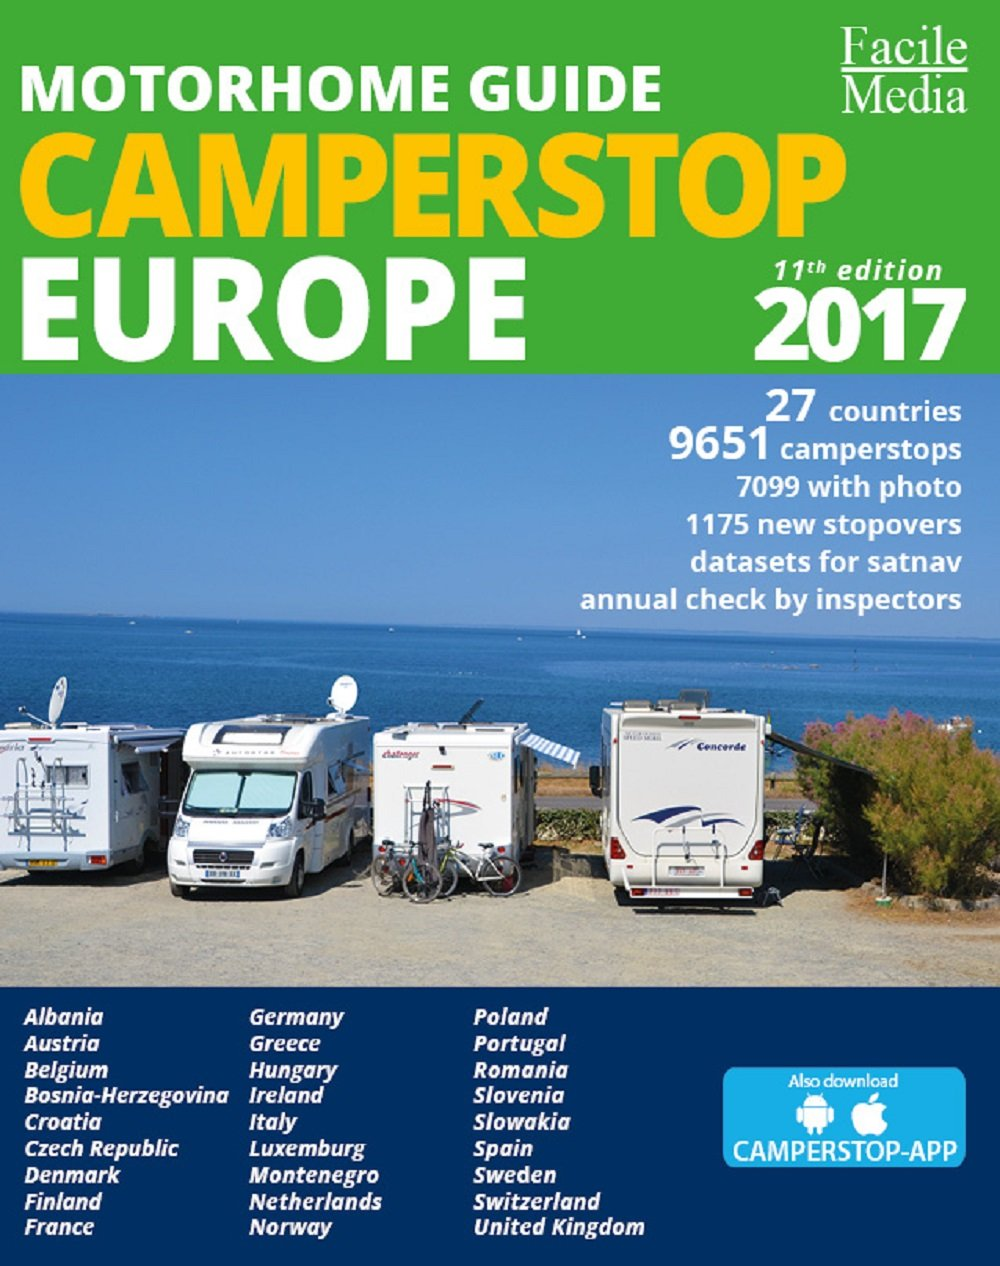 Motorhome Guide Camperstop Europe 27 Countries 2017